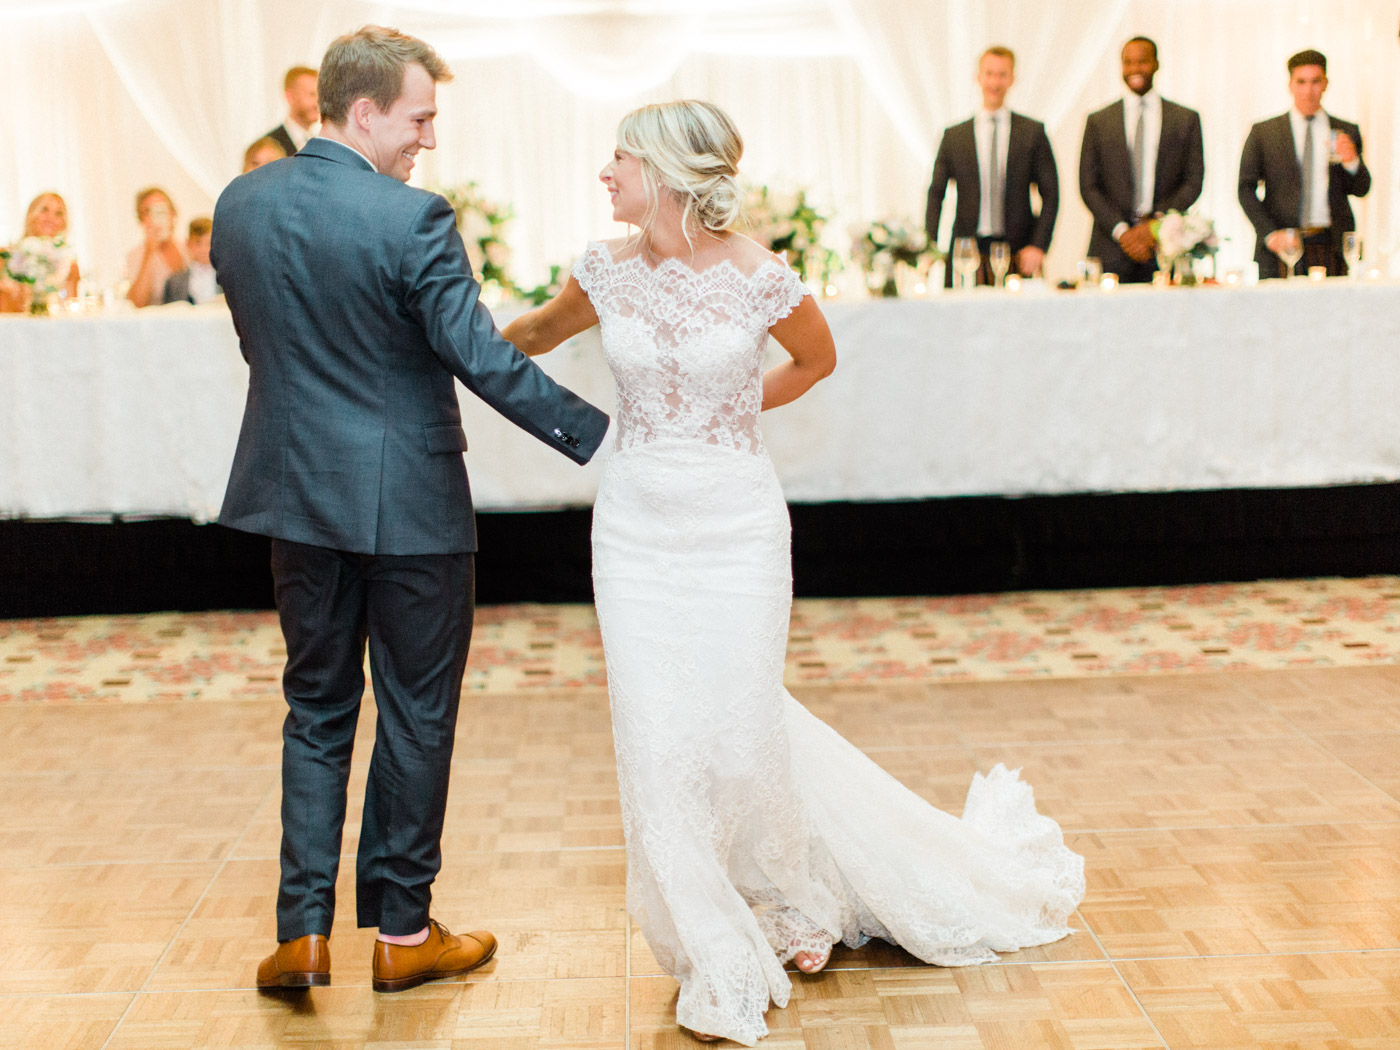 Toronto-Muskoka-wedding-photographer-summery-fun-documentary-the-marriott-rosseau137.jpg